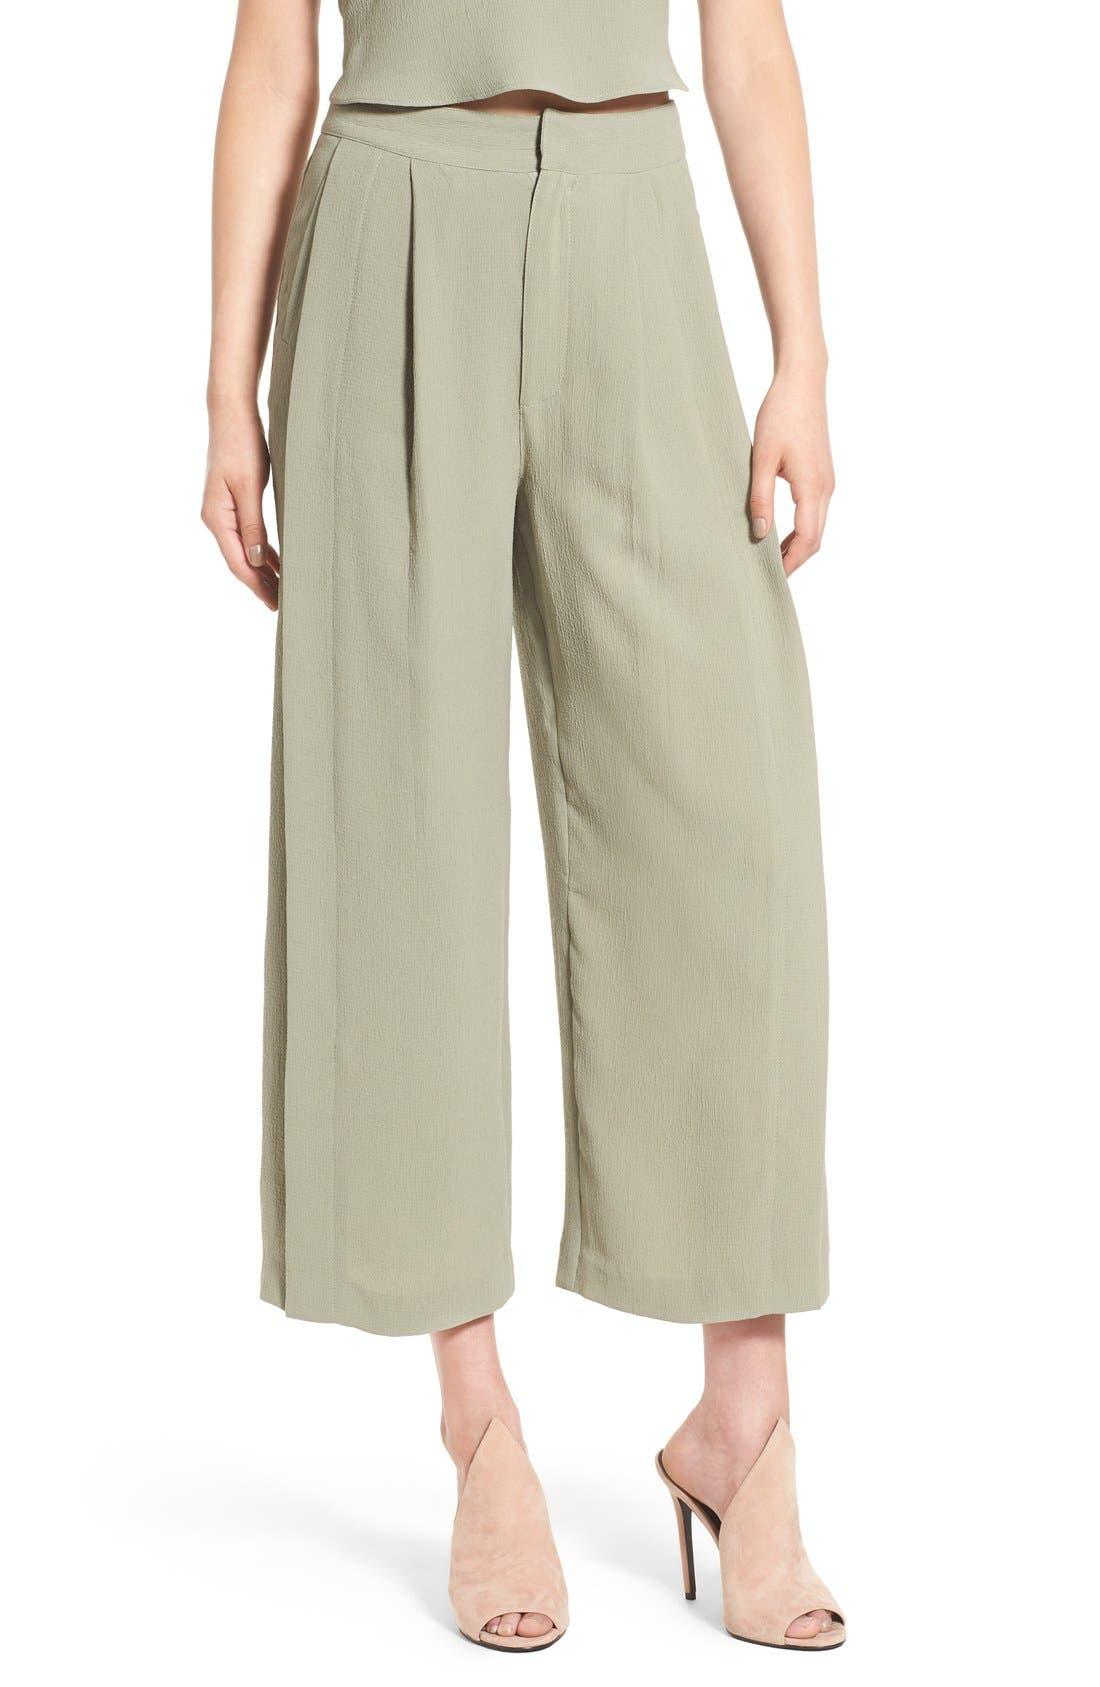 Alternate Image 1 Selected - KENDALL + KYLIE High Waist Wide Leg Crop Pants